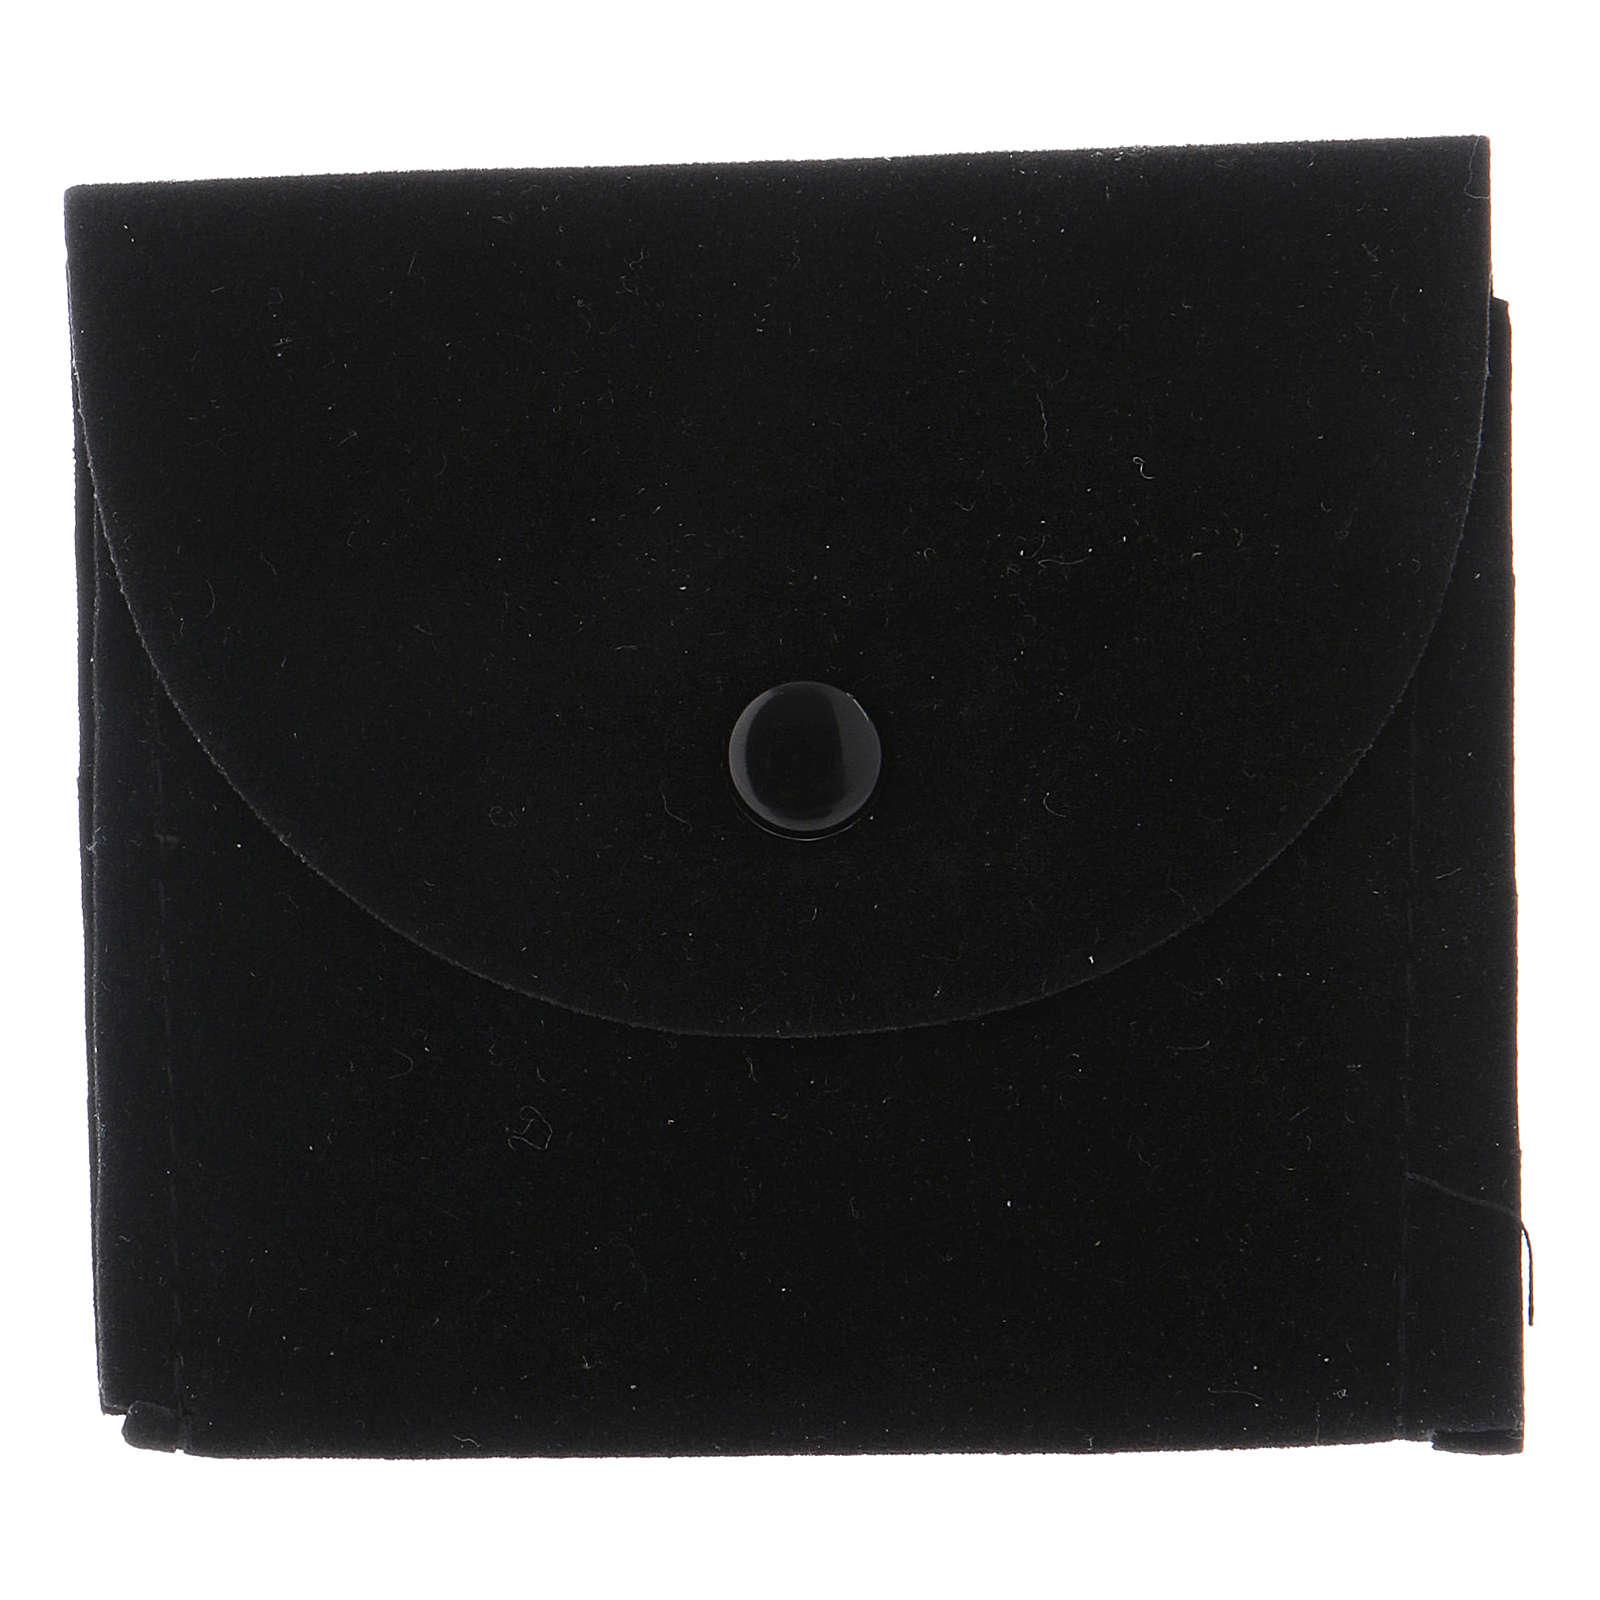 Portateca bustina scamosciata nera 3